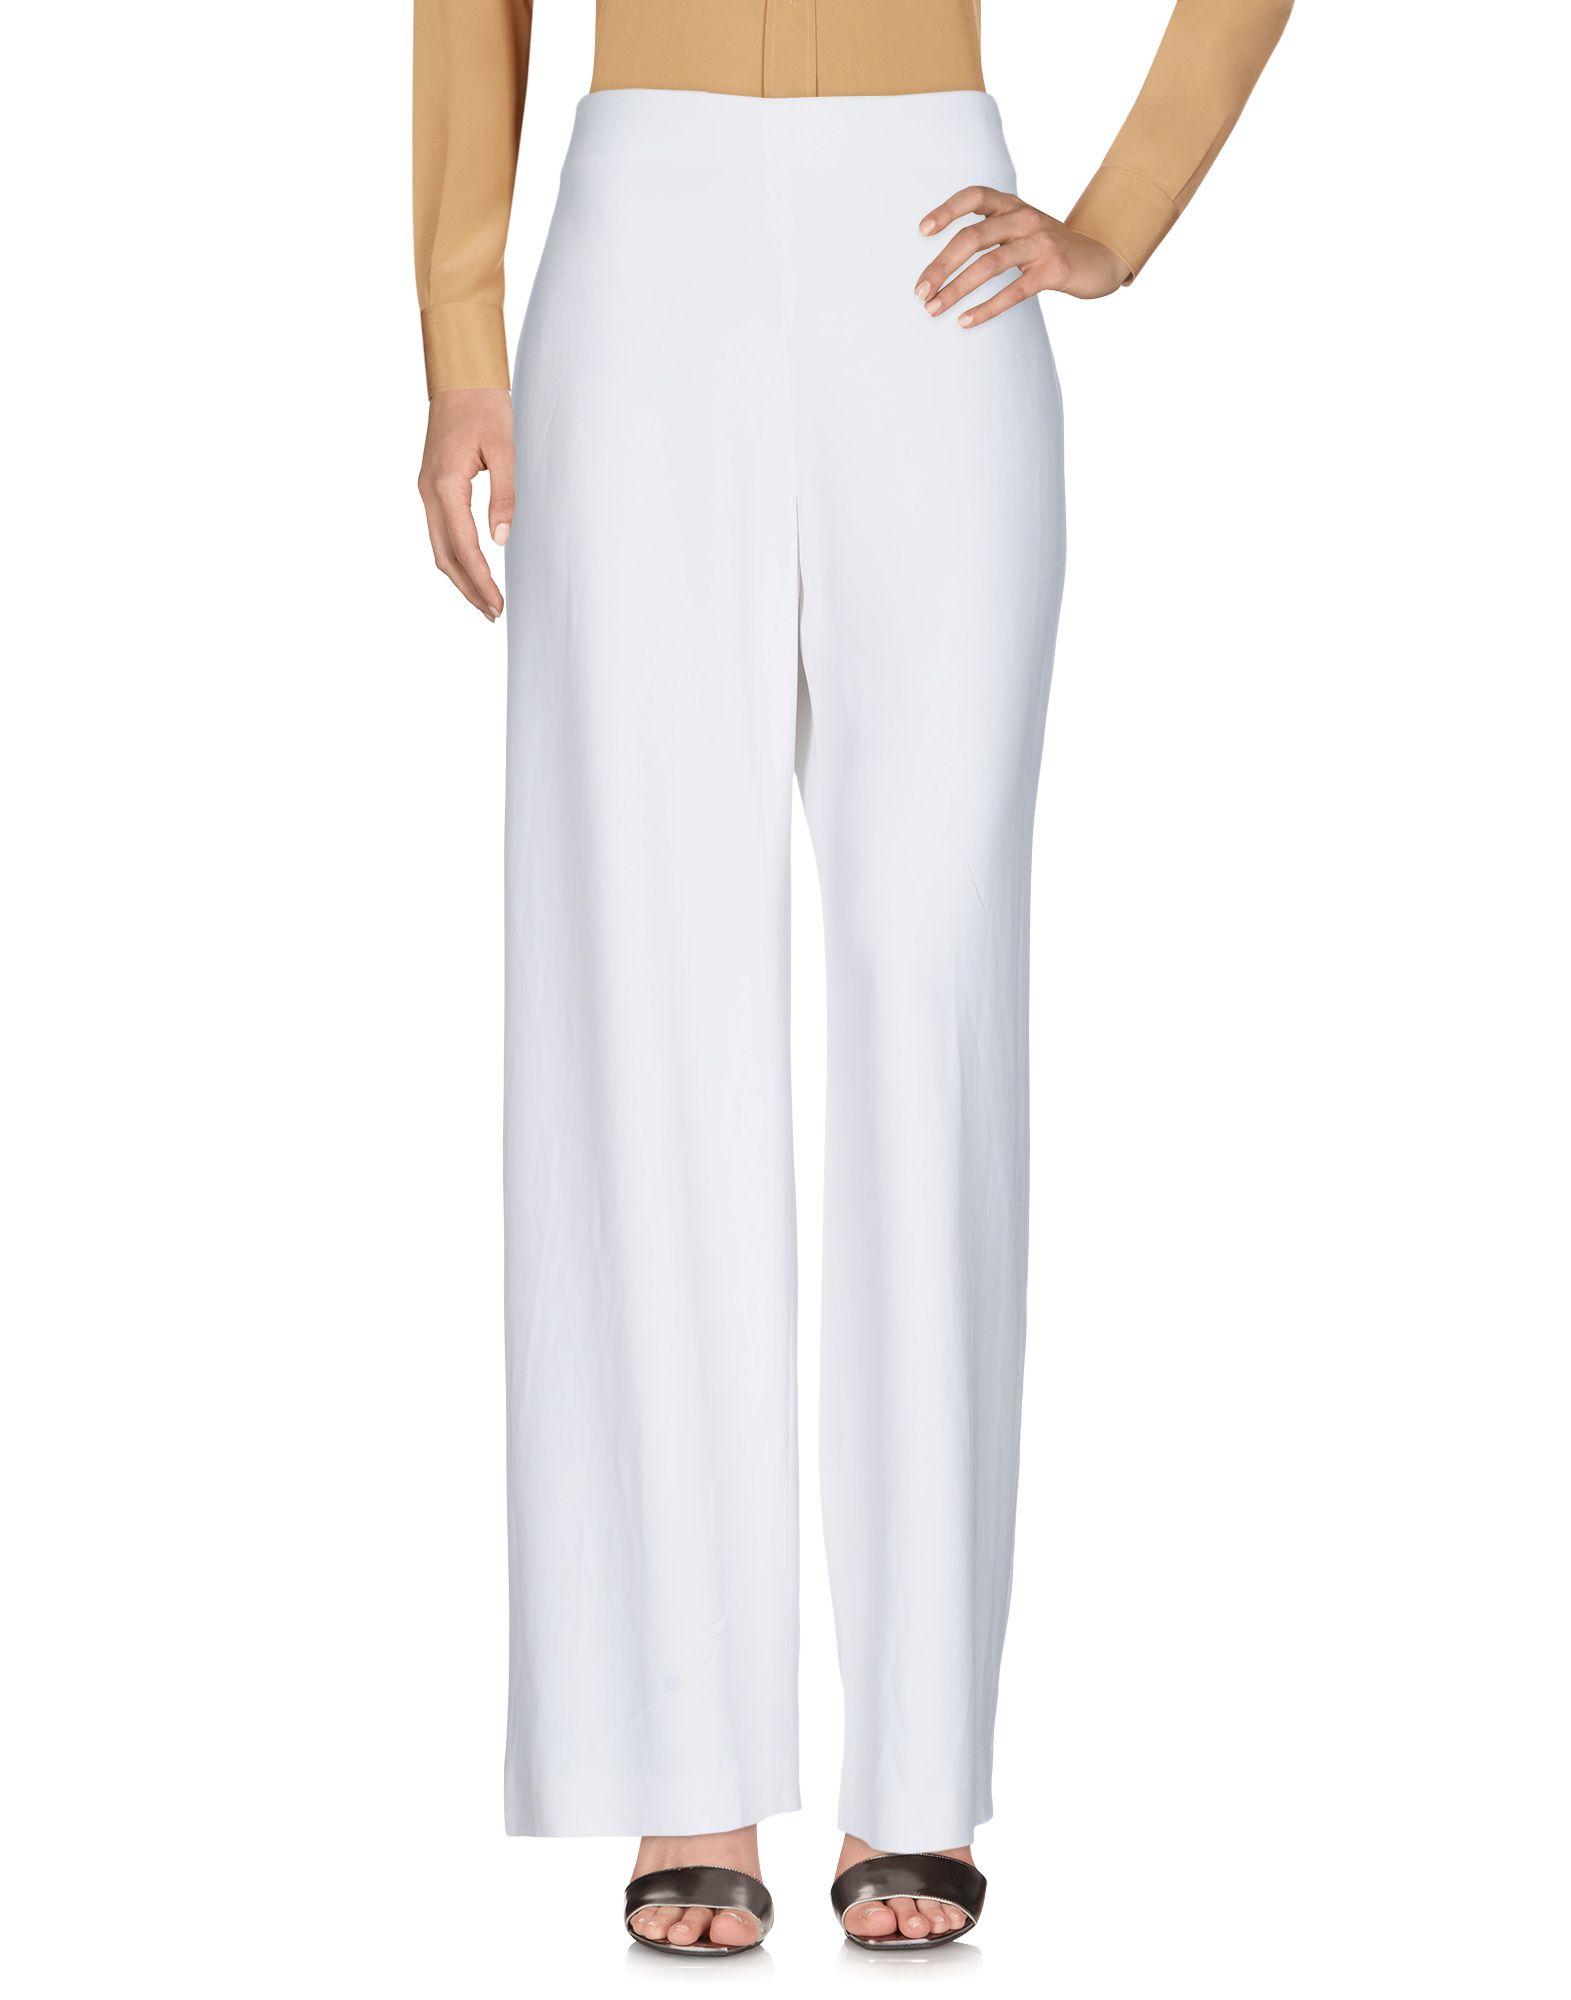 Pantalone Tom Ford Donna - Acquista online su oUwKuraX